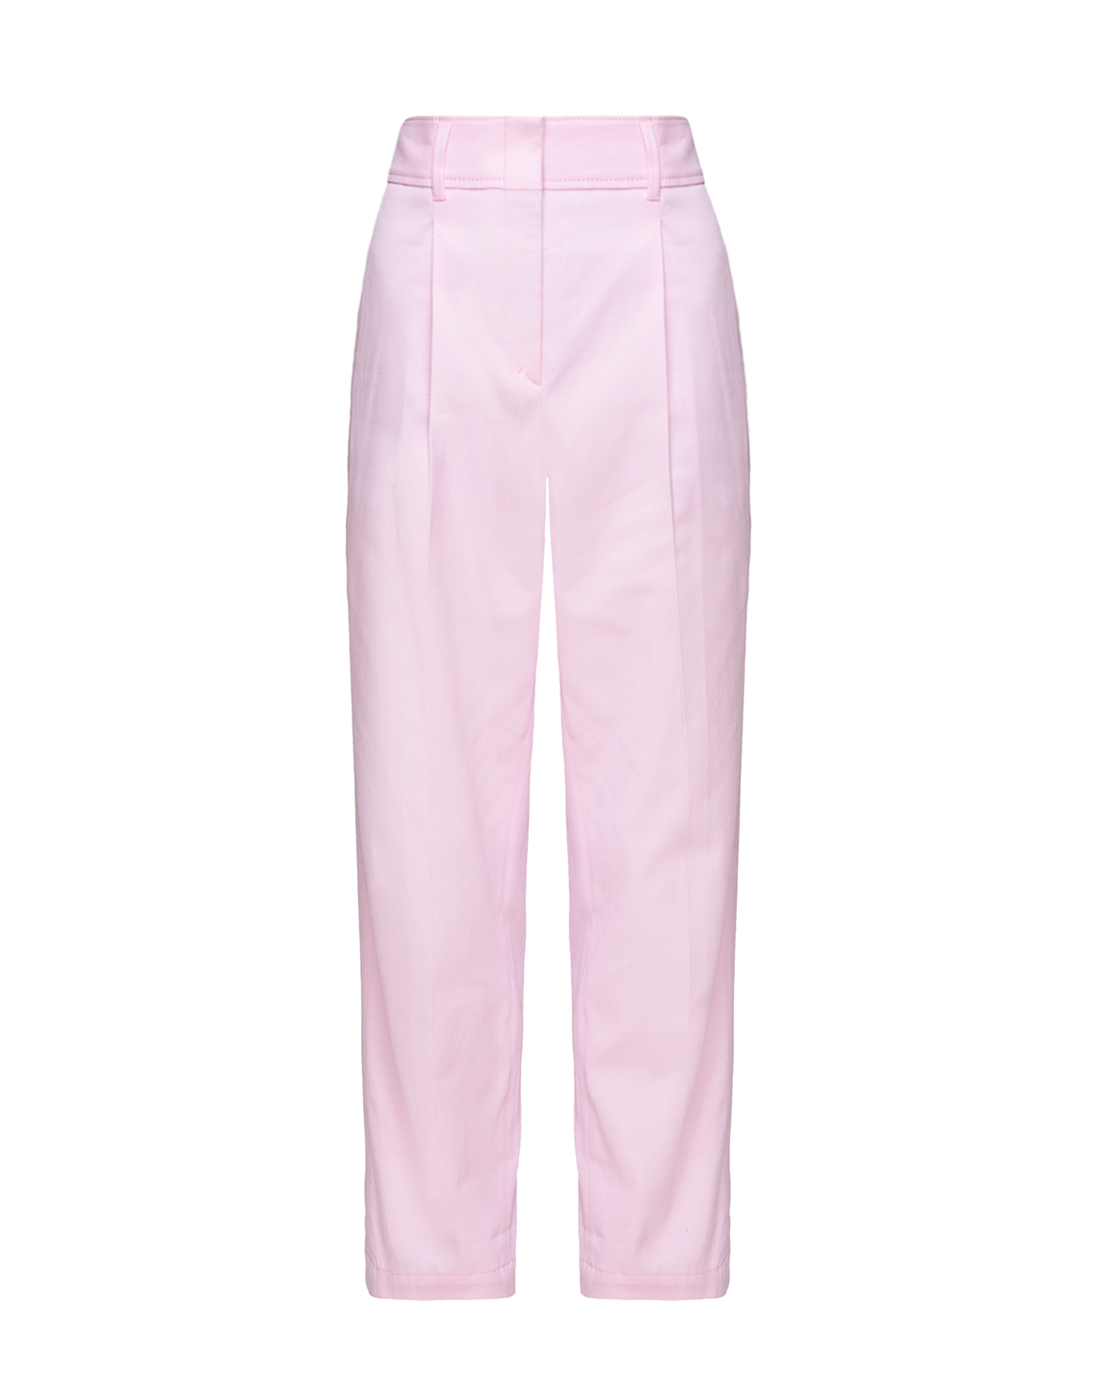 Женские розовые брюки Dorothee Schumacher S640403/421-1